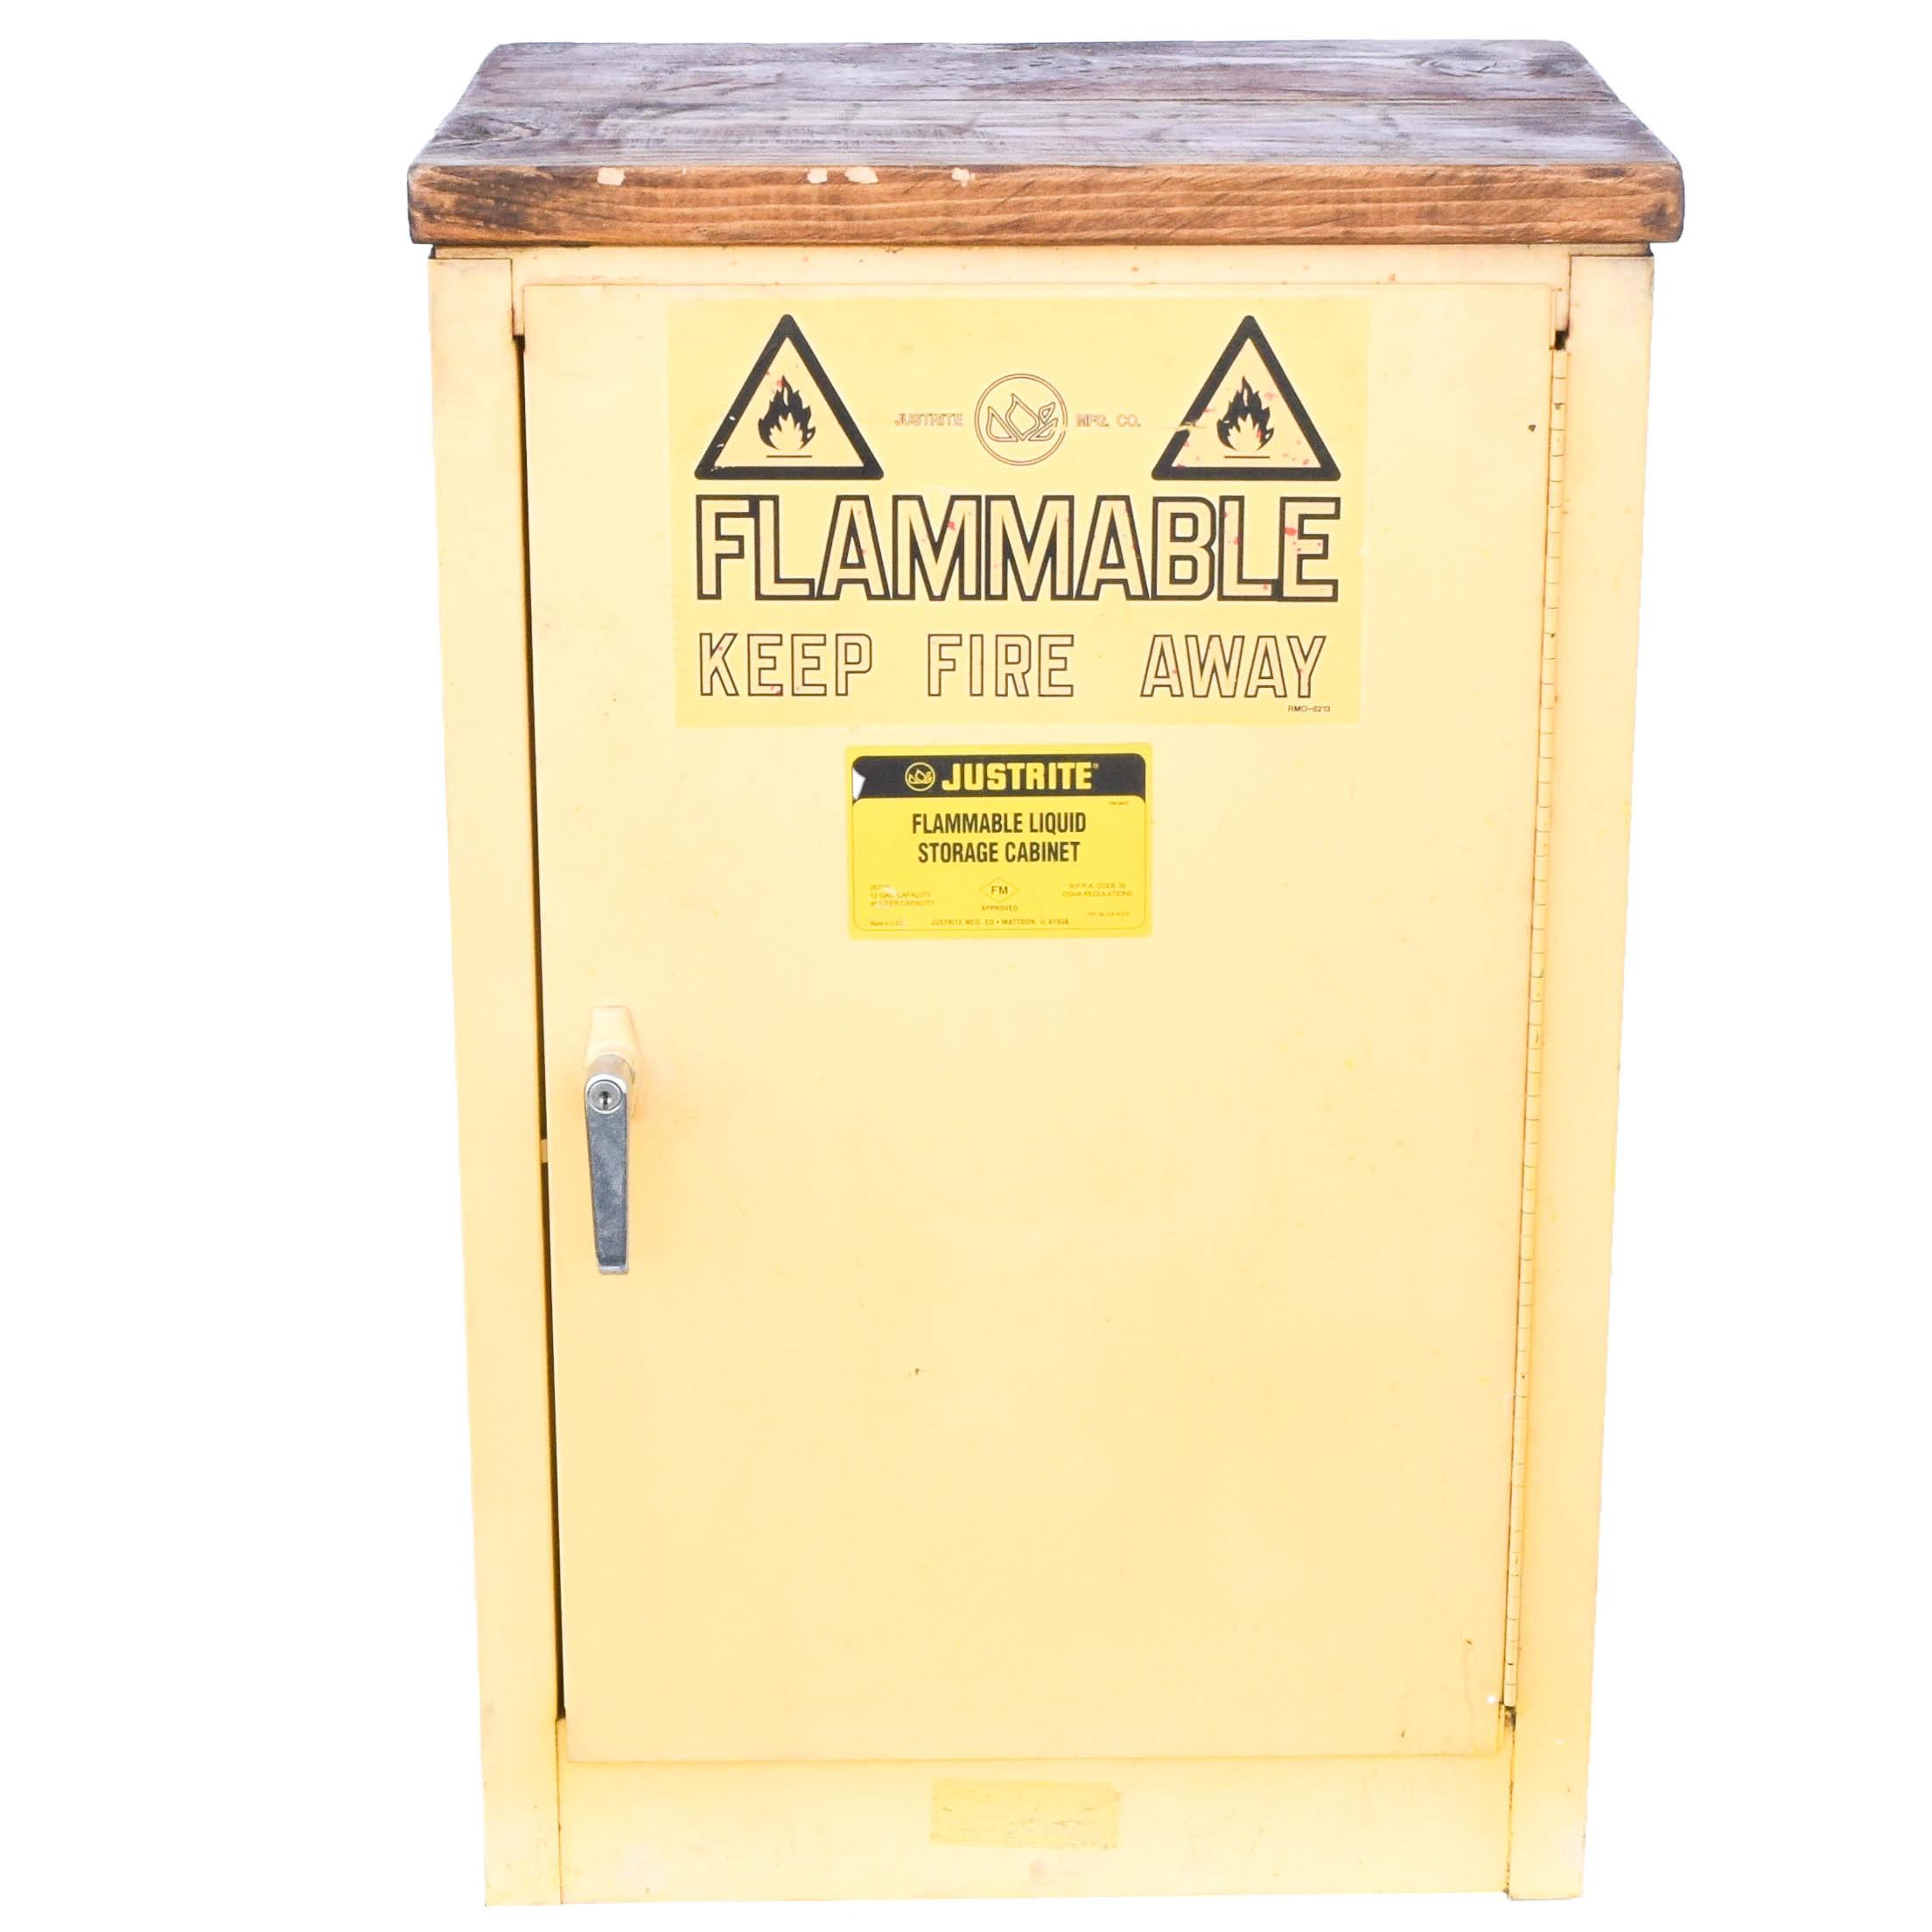 Repurposed Justrite Flammable Liquid Storage Cabinet